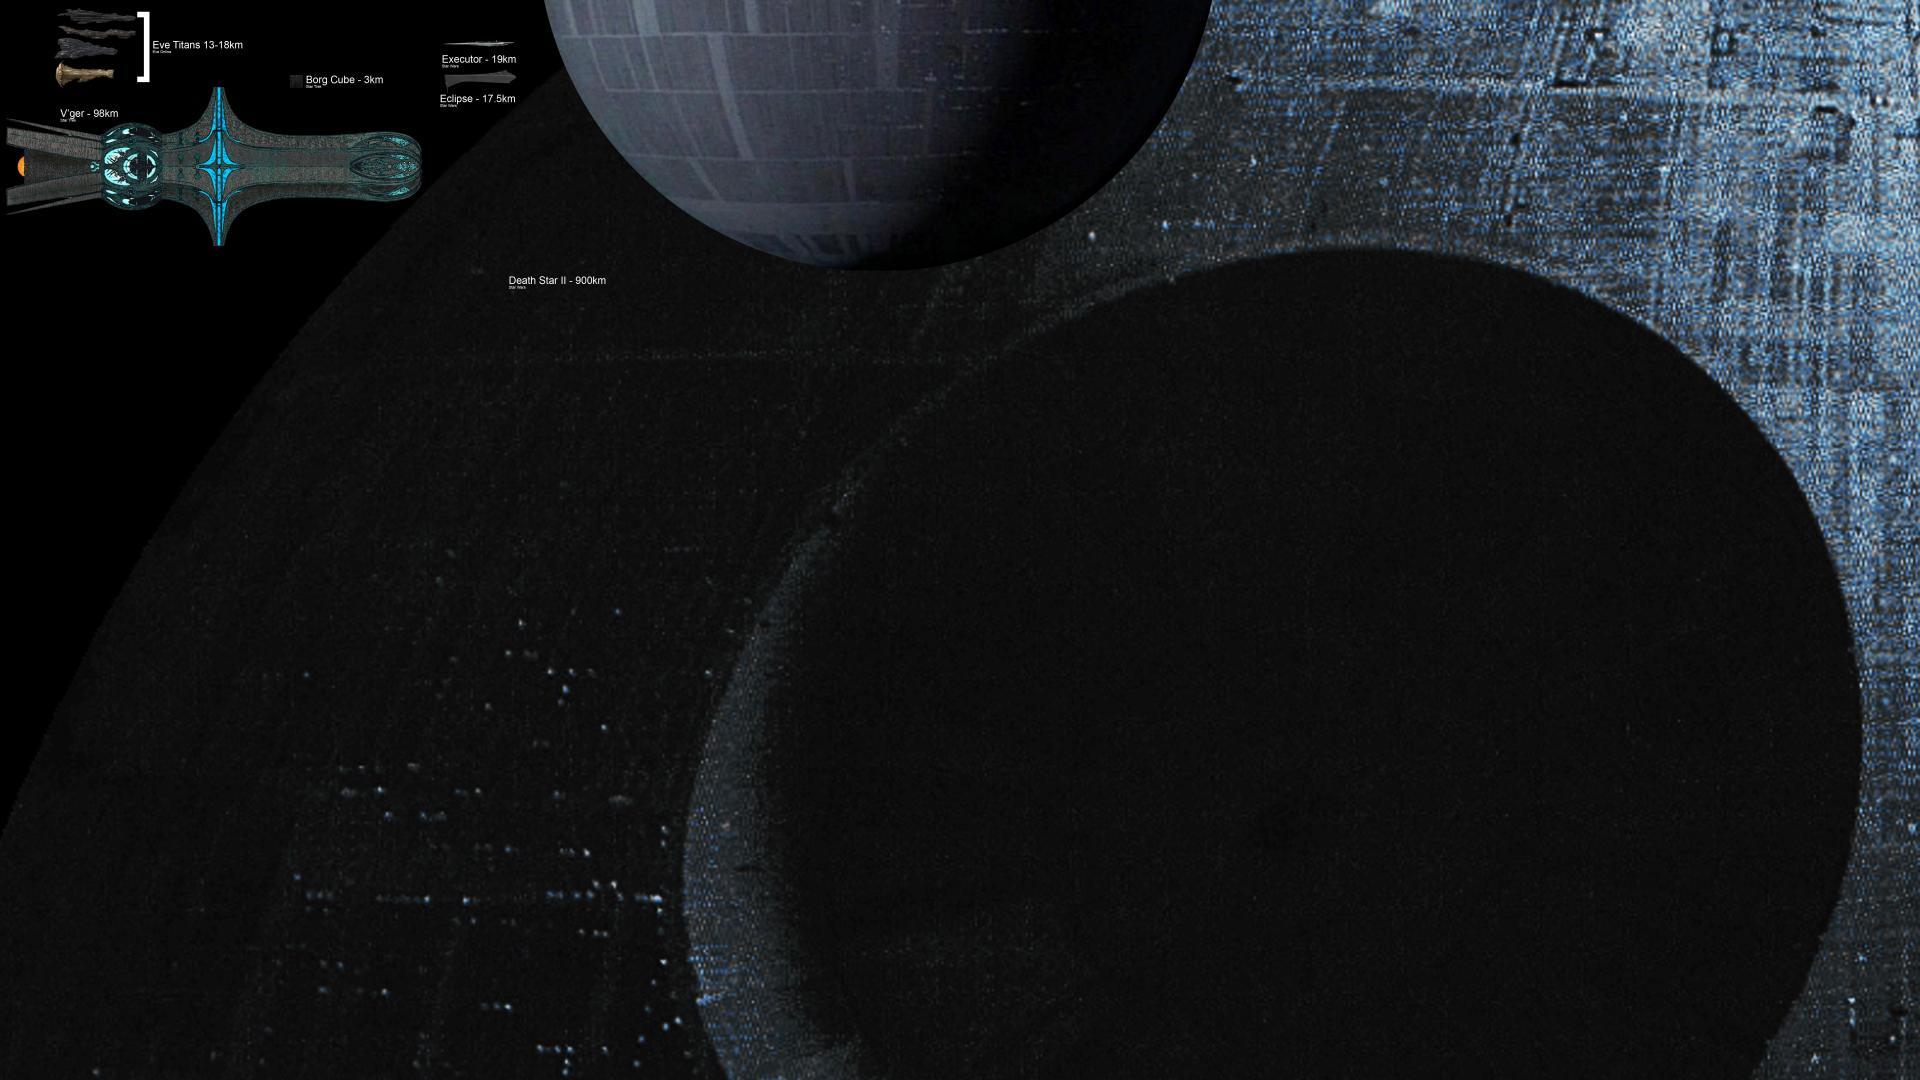 Skyrim Fall Wallpaper Hd Free Death Star Backgrounds Download Pixelstalk Net